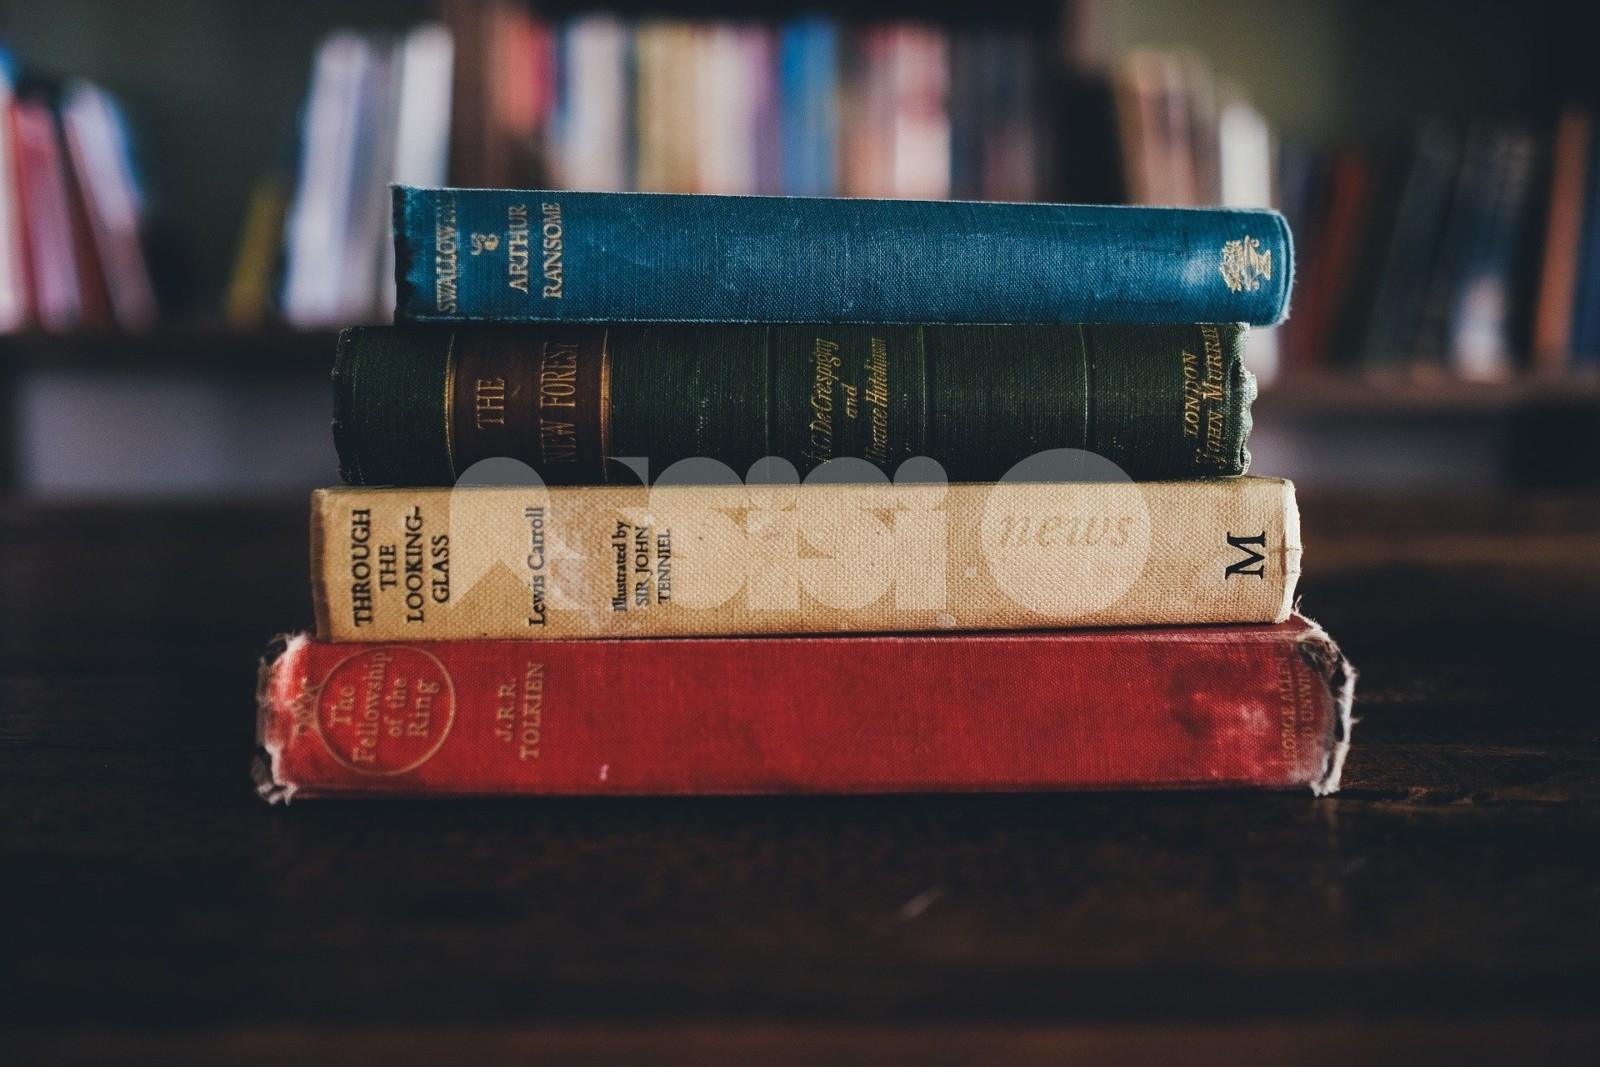 Biblioteche ad Assisi e Bastia Umbra protagoniste del Natale